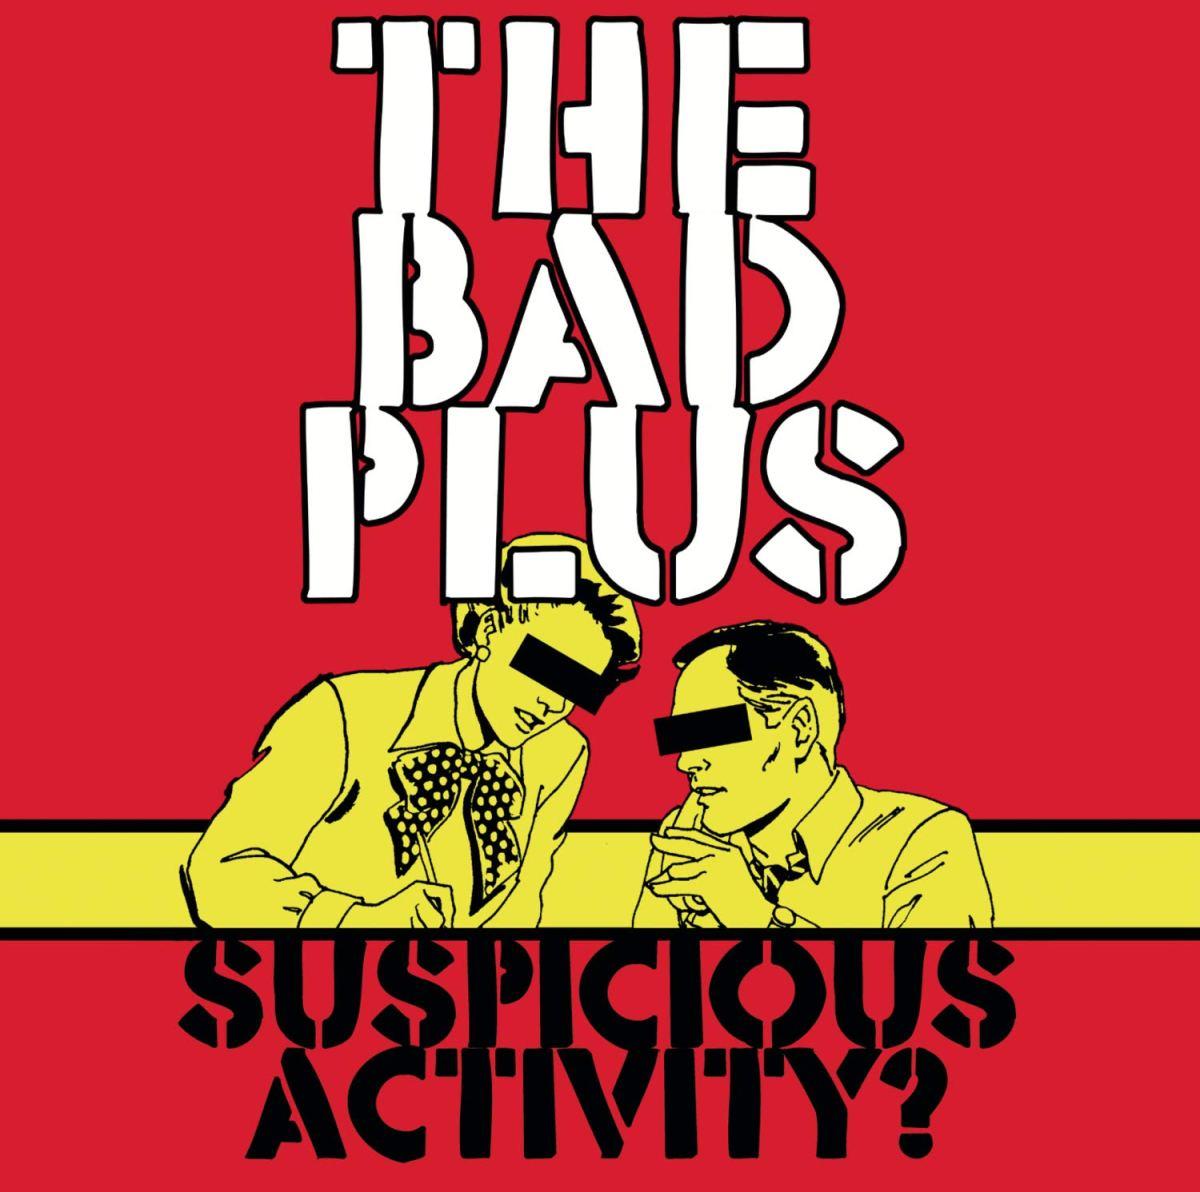 TUESDAY TUNES: SUSPICIOUSACTIVITY?